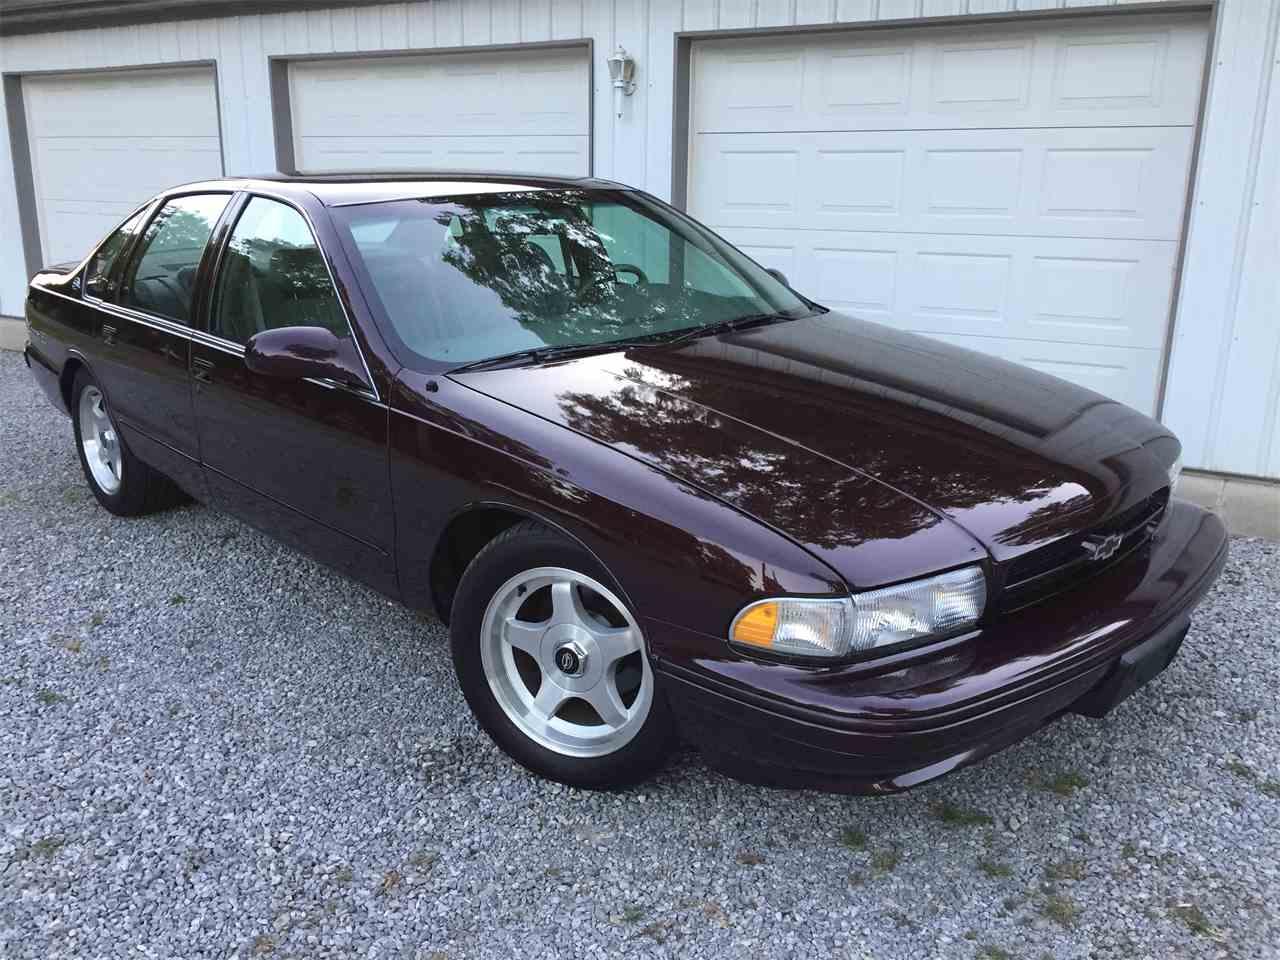 Large Picture of '96 Impala SS located in Eldorado Illinois - $17,000.00 - LEX3